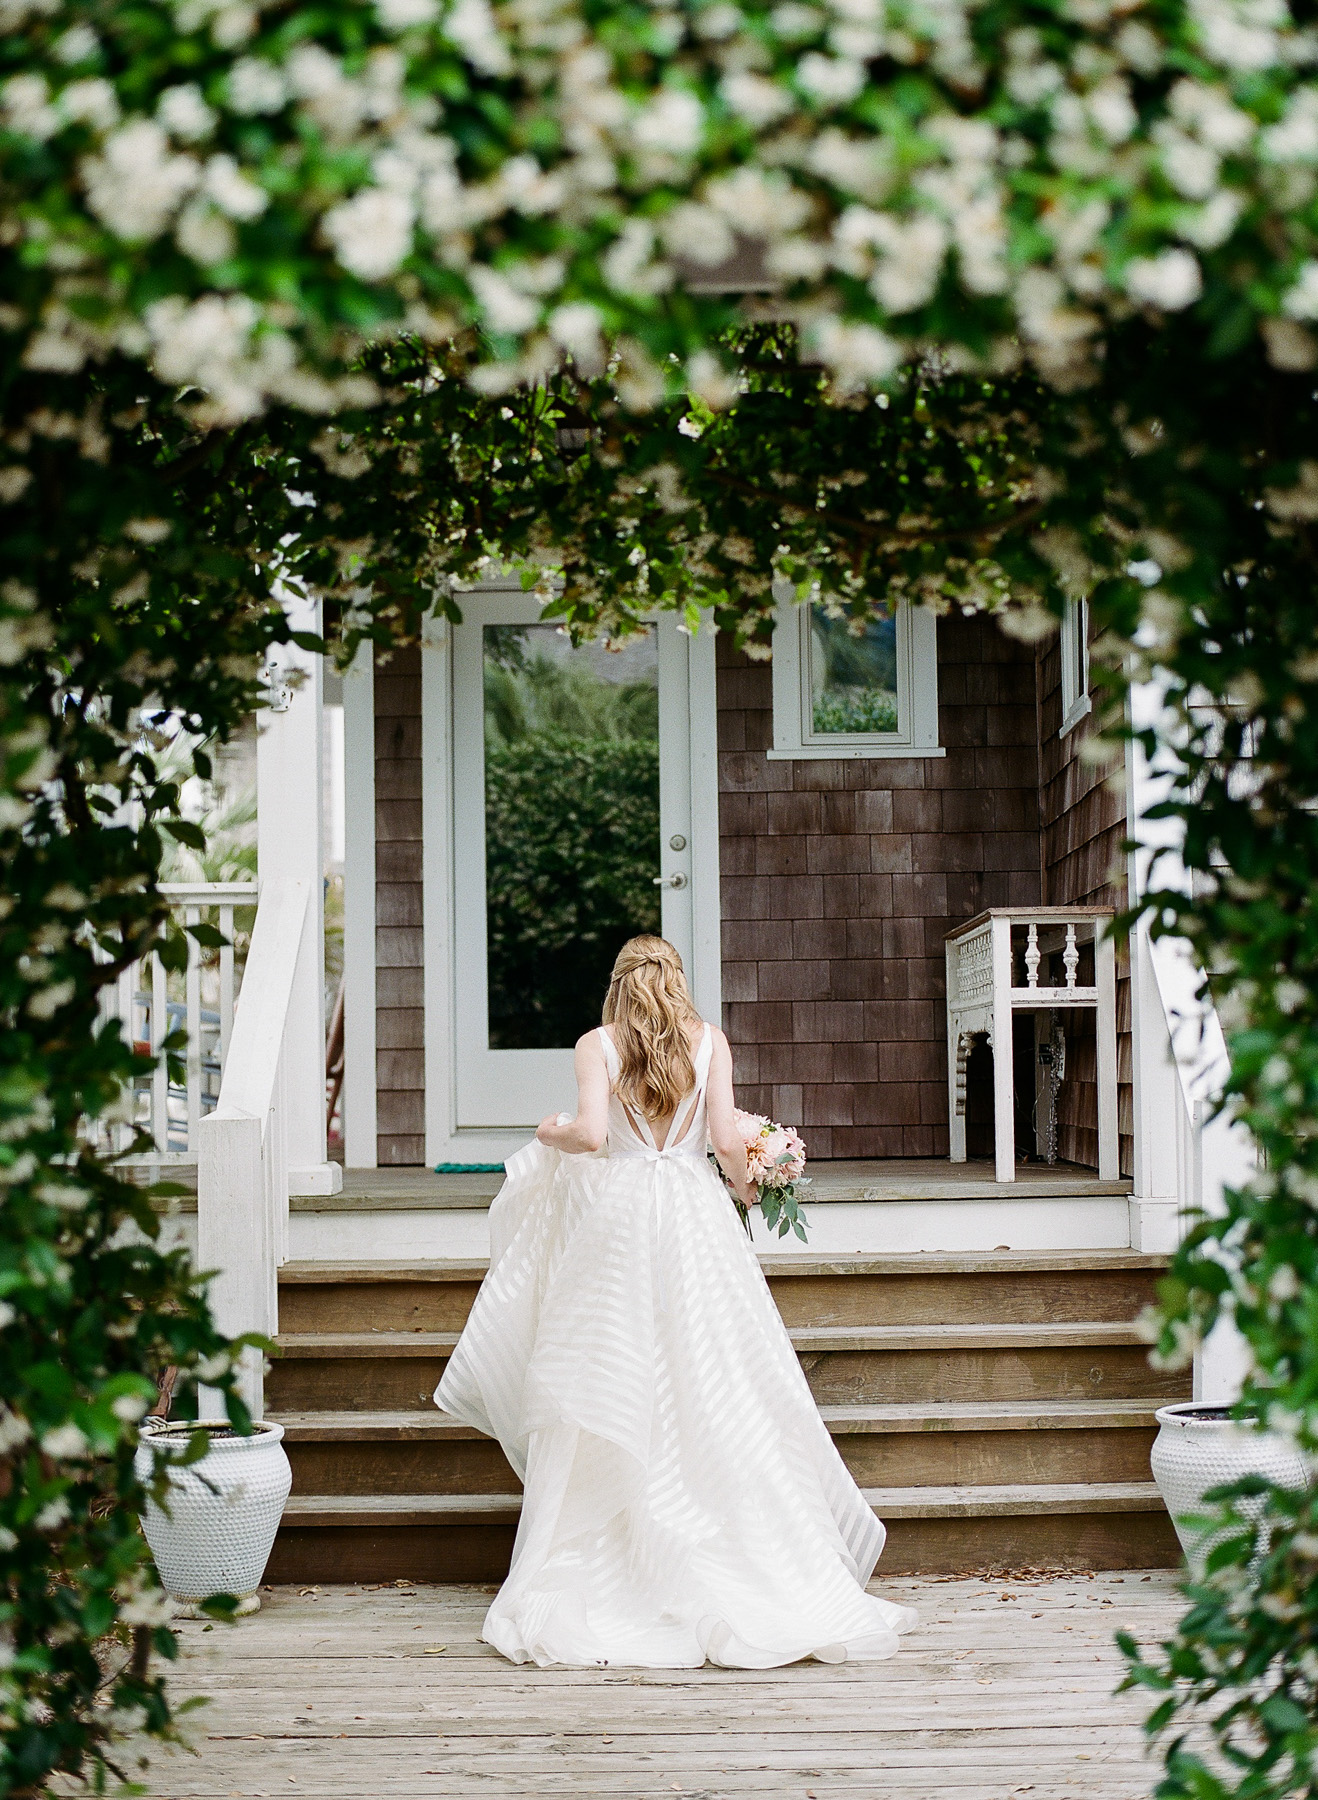 NC-wedding-photographer-best-04.jpg